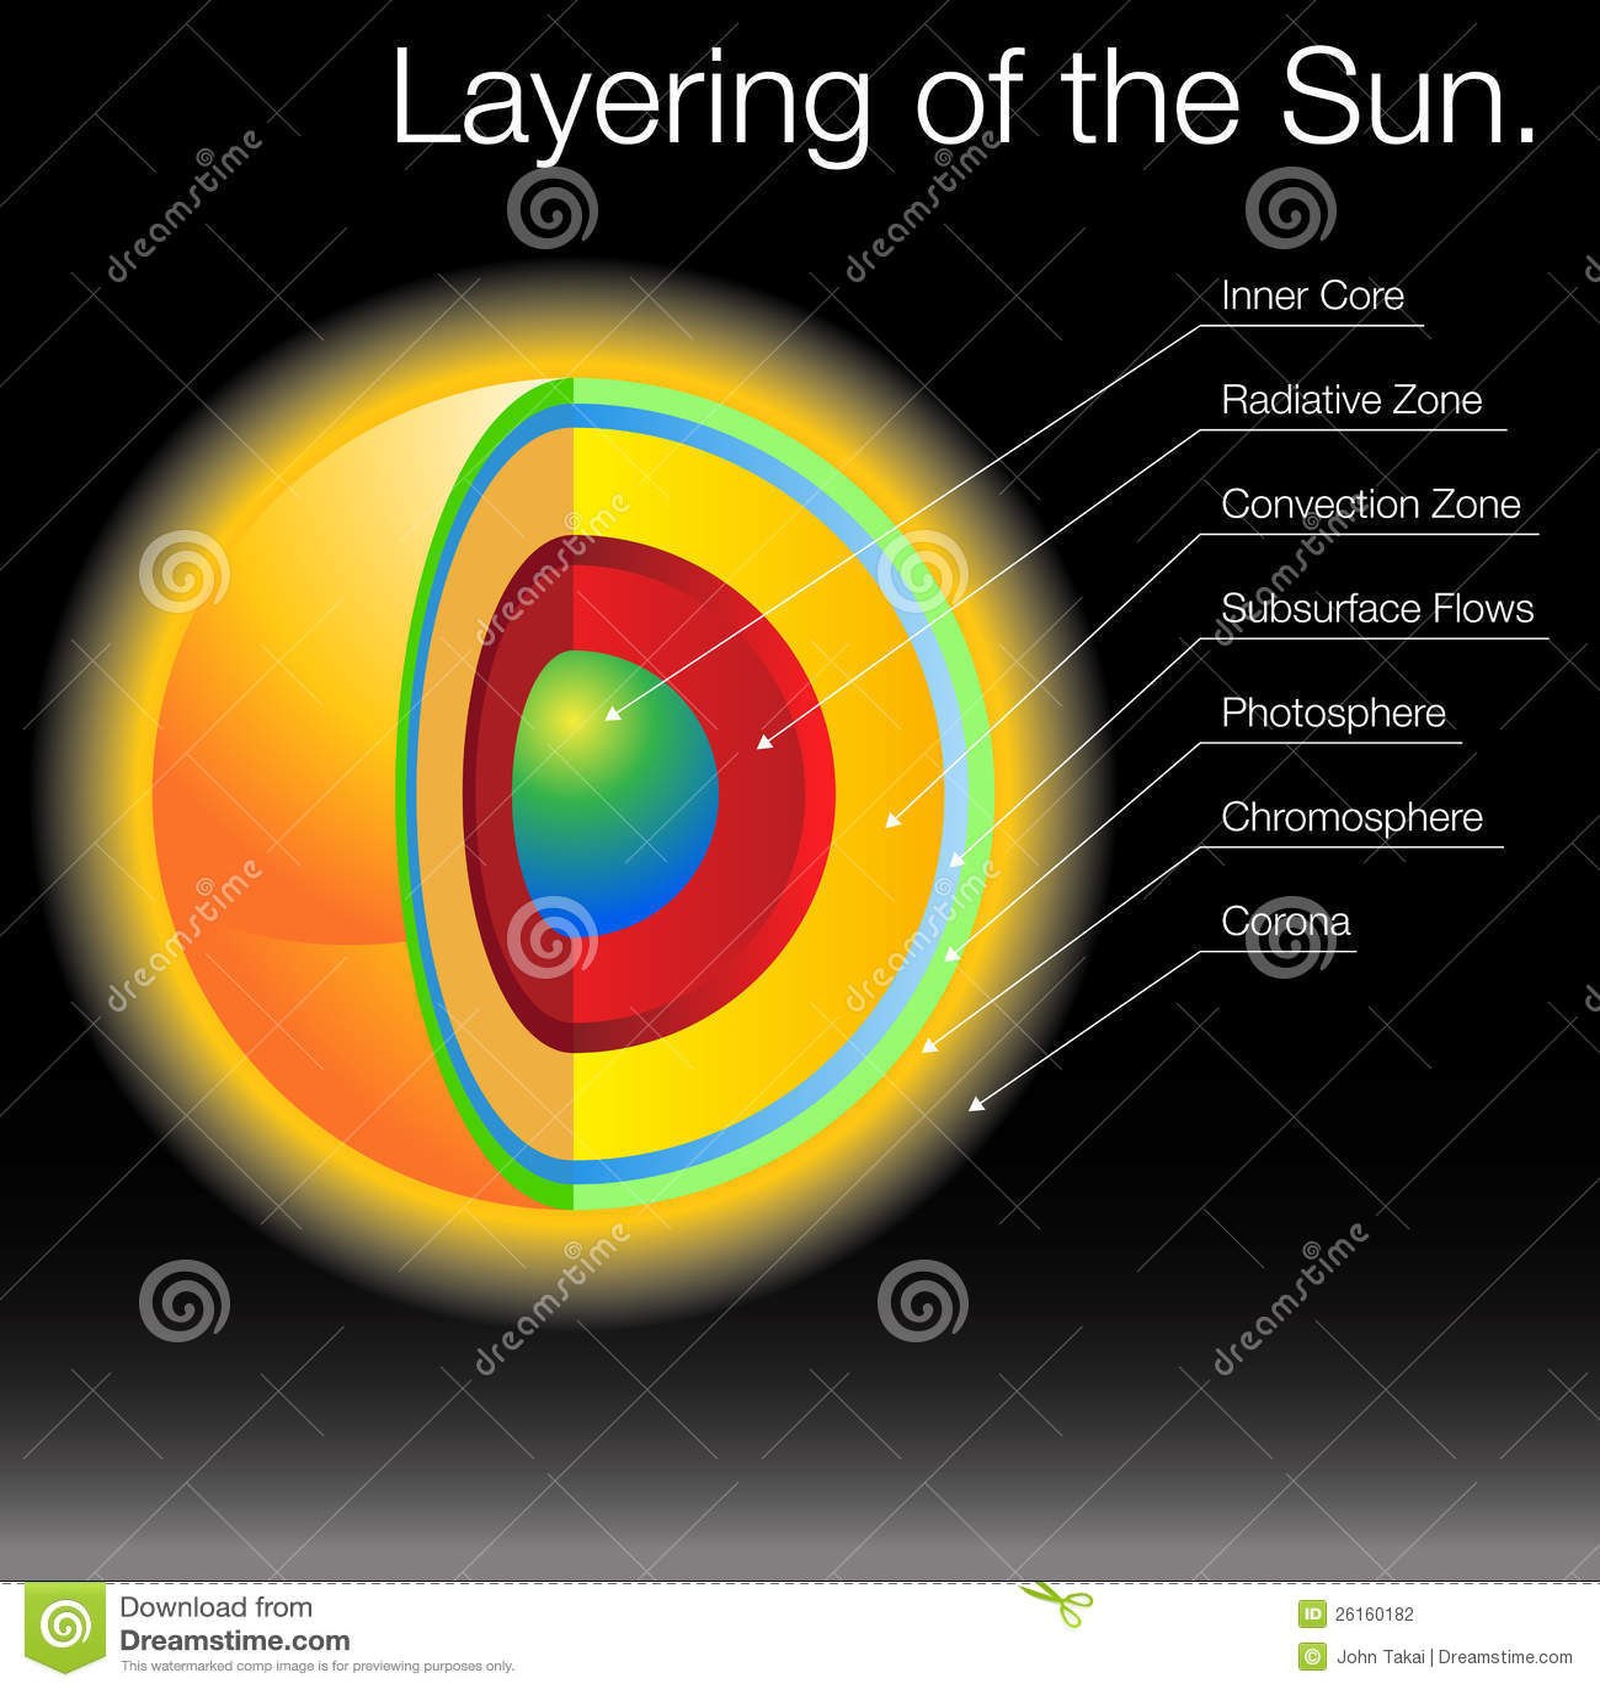 layers of the sun diagram rotork iq35 wiring layering stock vector illustration